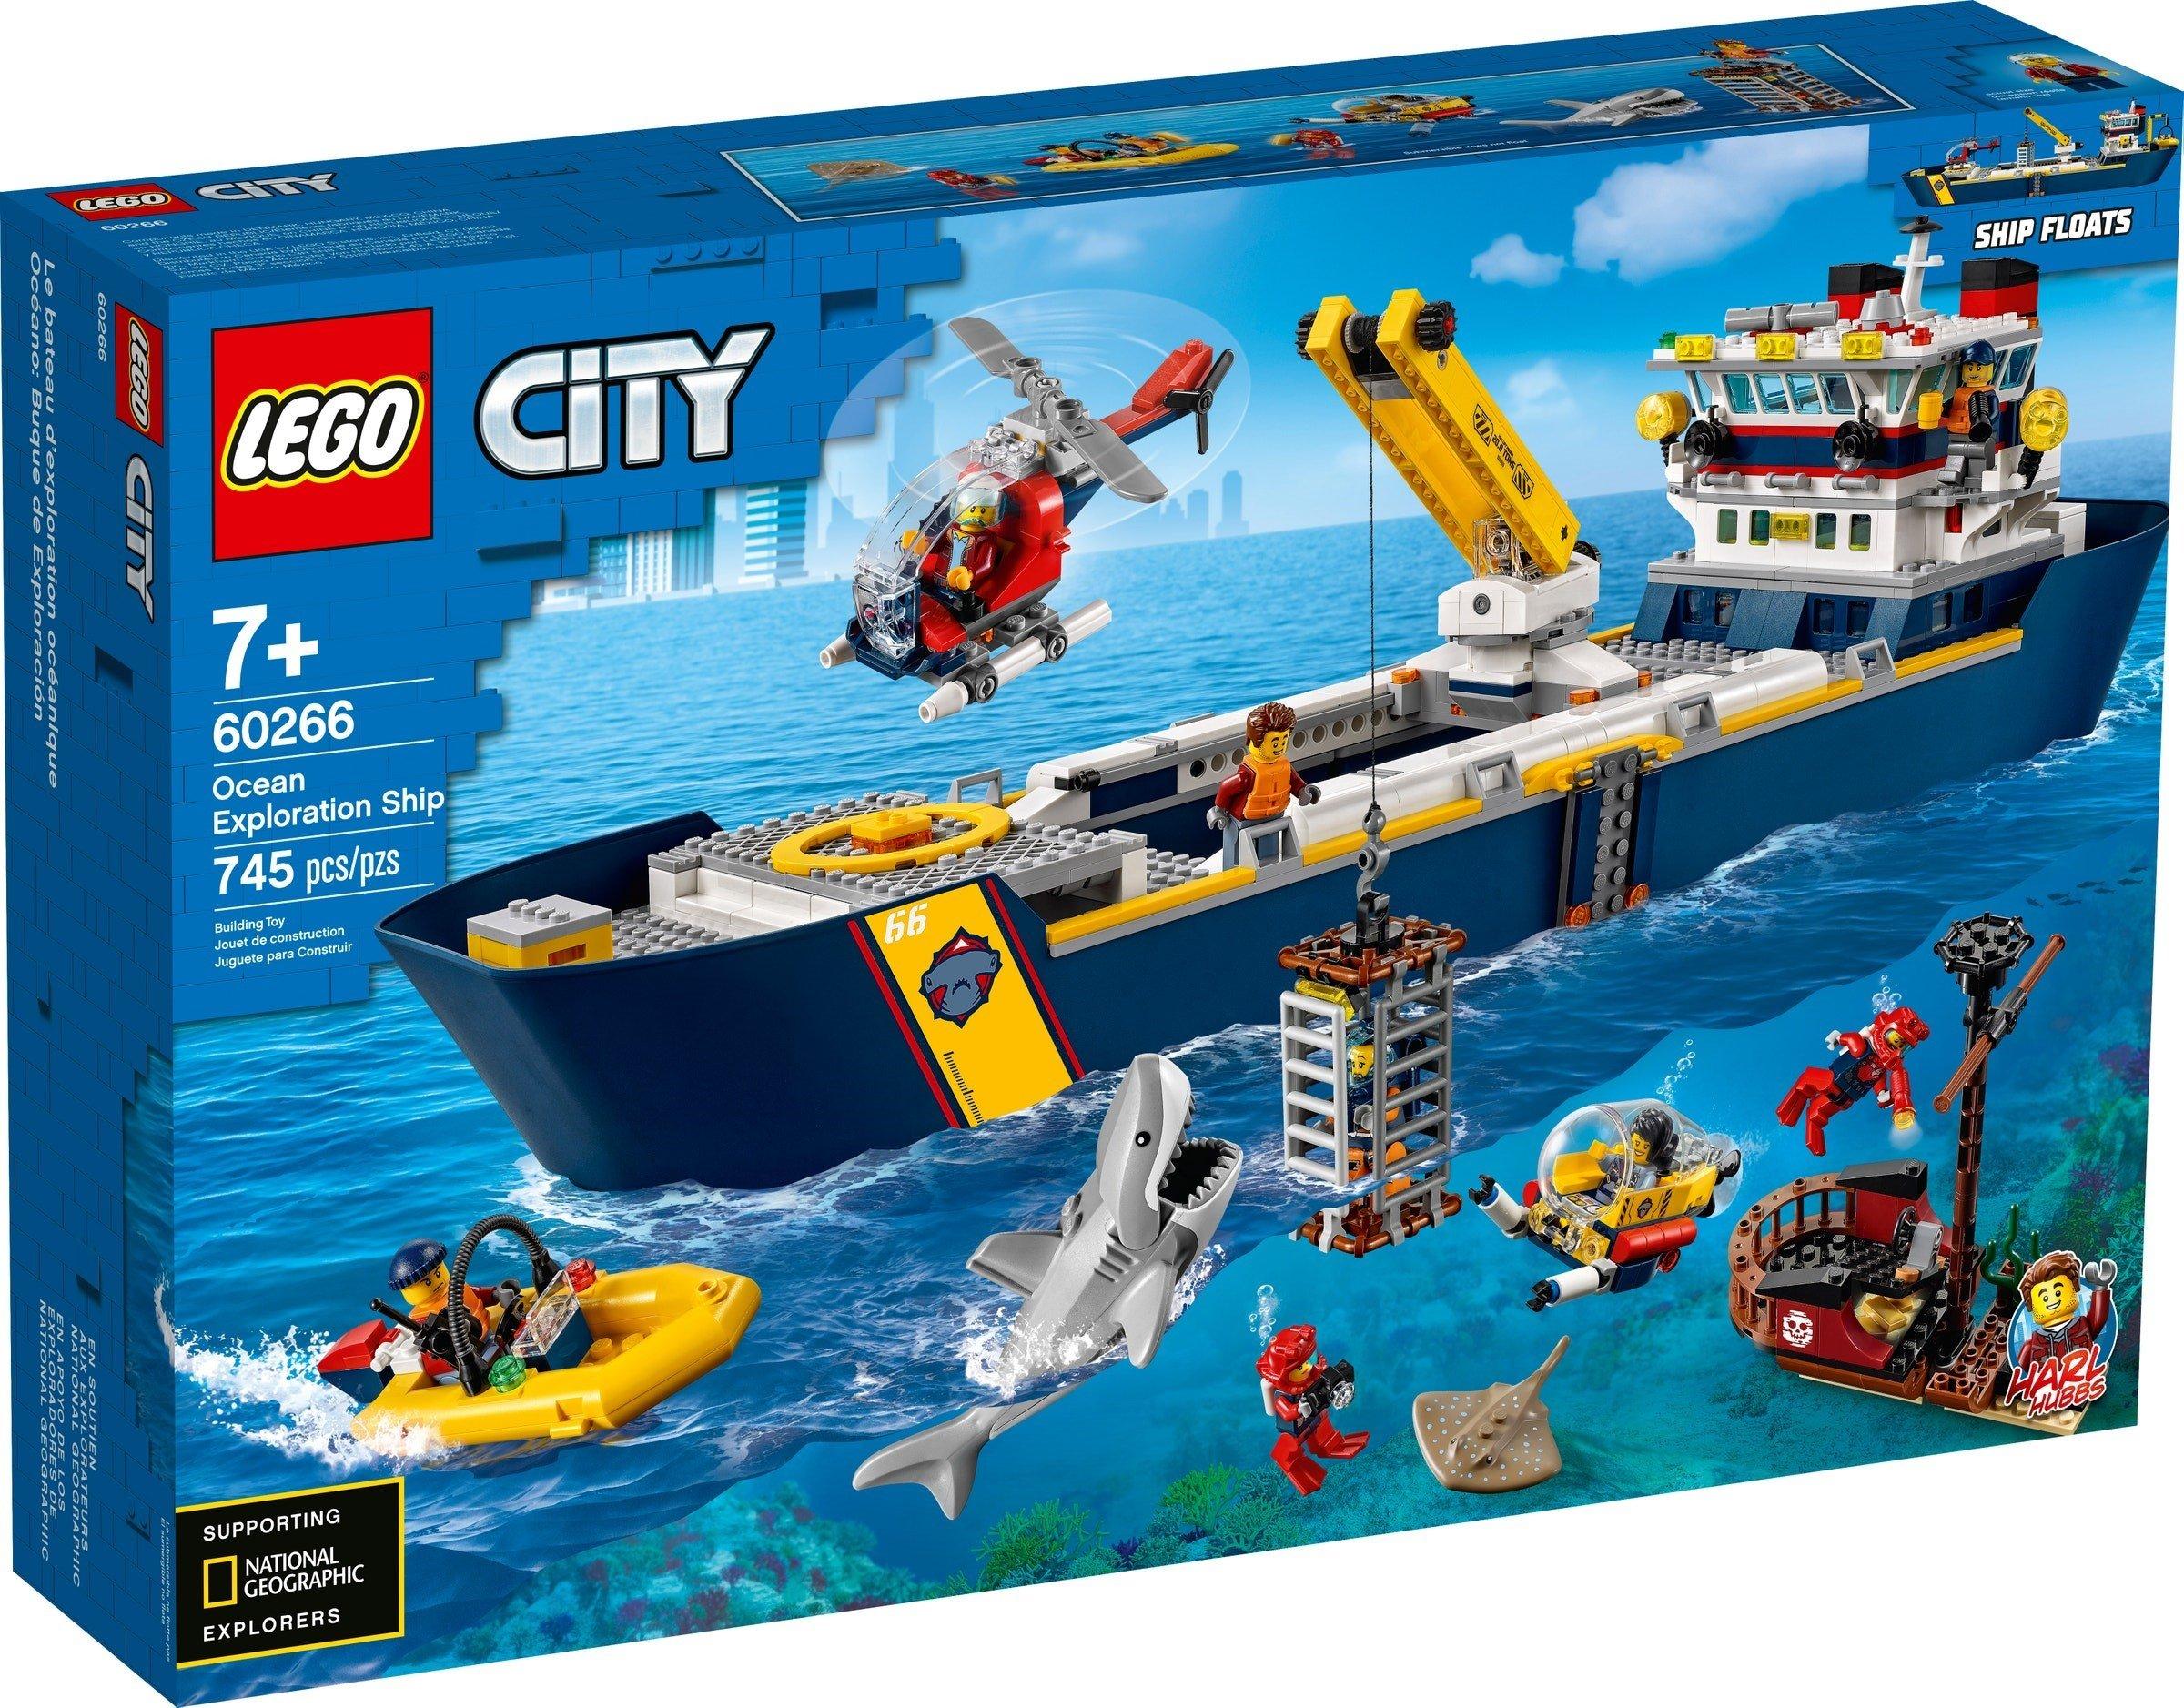 LEGO City - Ocean Exploration Ship (60266)